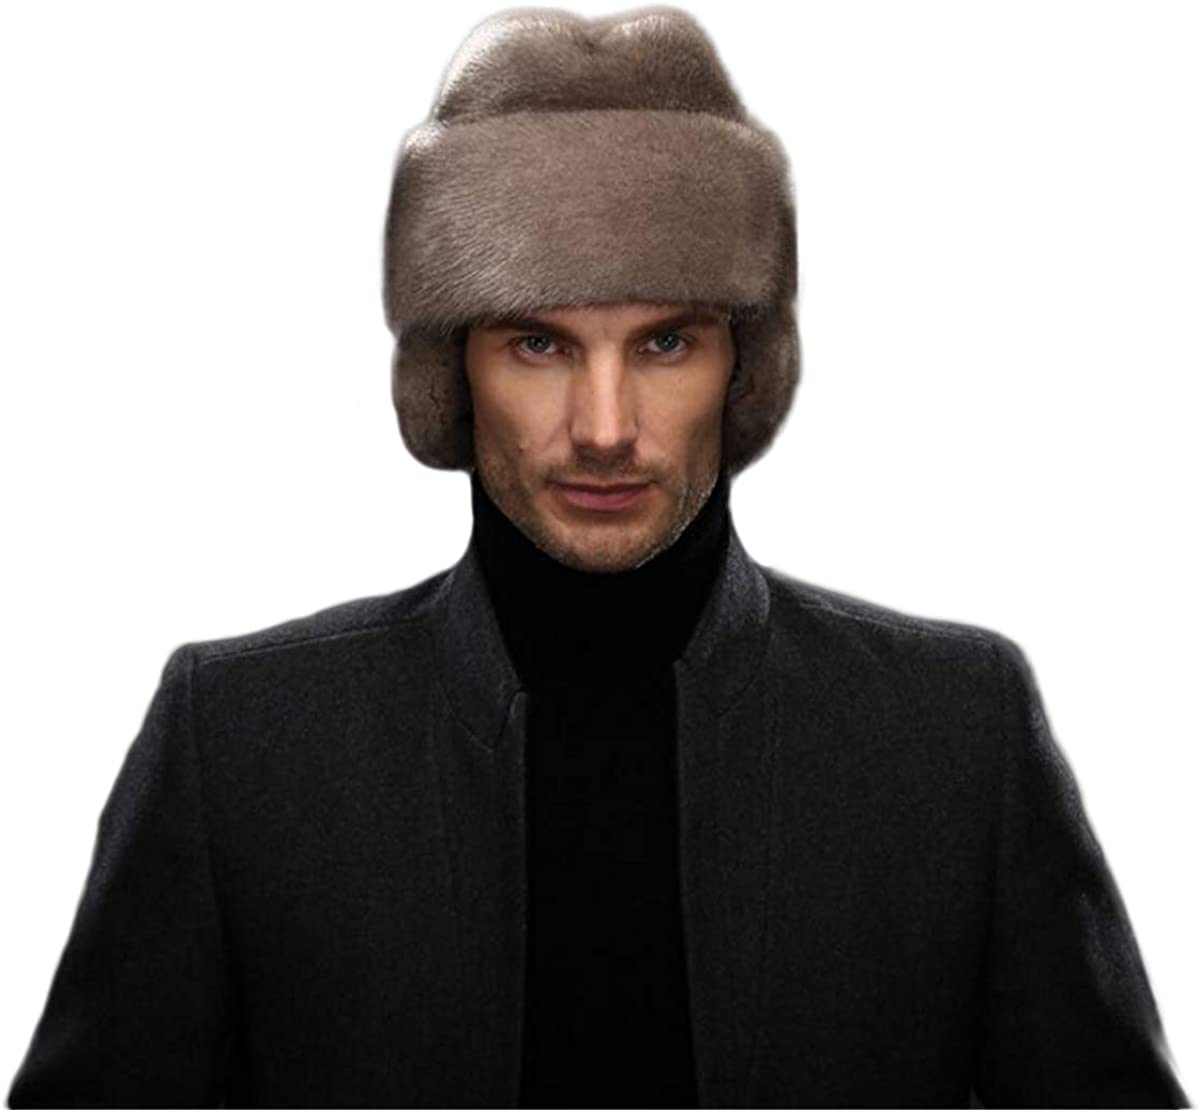 KAISHIN Max 41% OFF French Men Full-pelt Mink Fur 35% OFF Winter Flaps Ear Male Hats